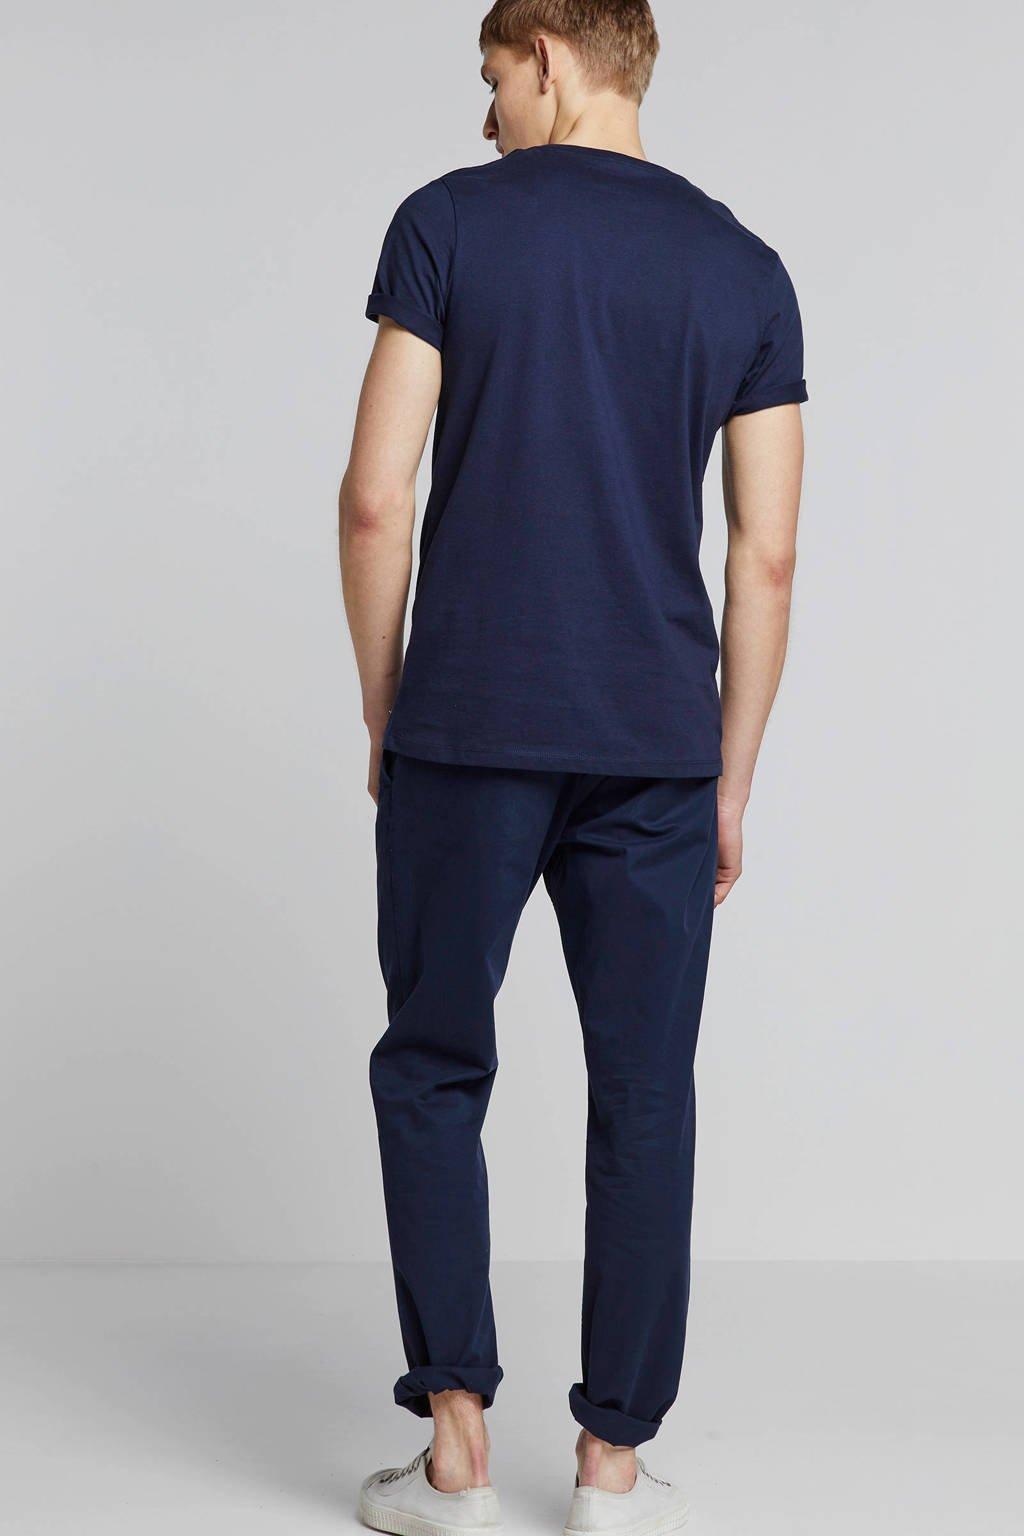 Jack & Jones Premium -shirt met printopdruk marine, Marine/beige